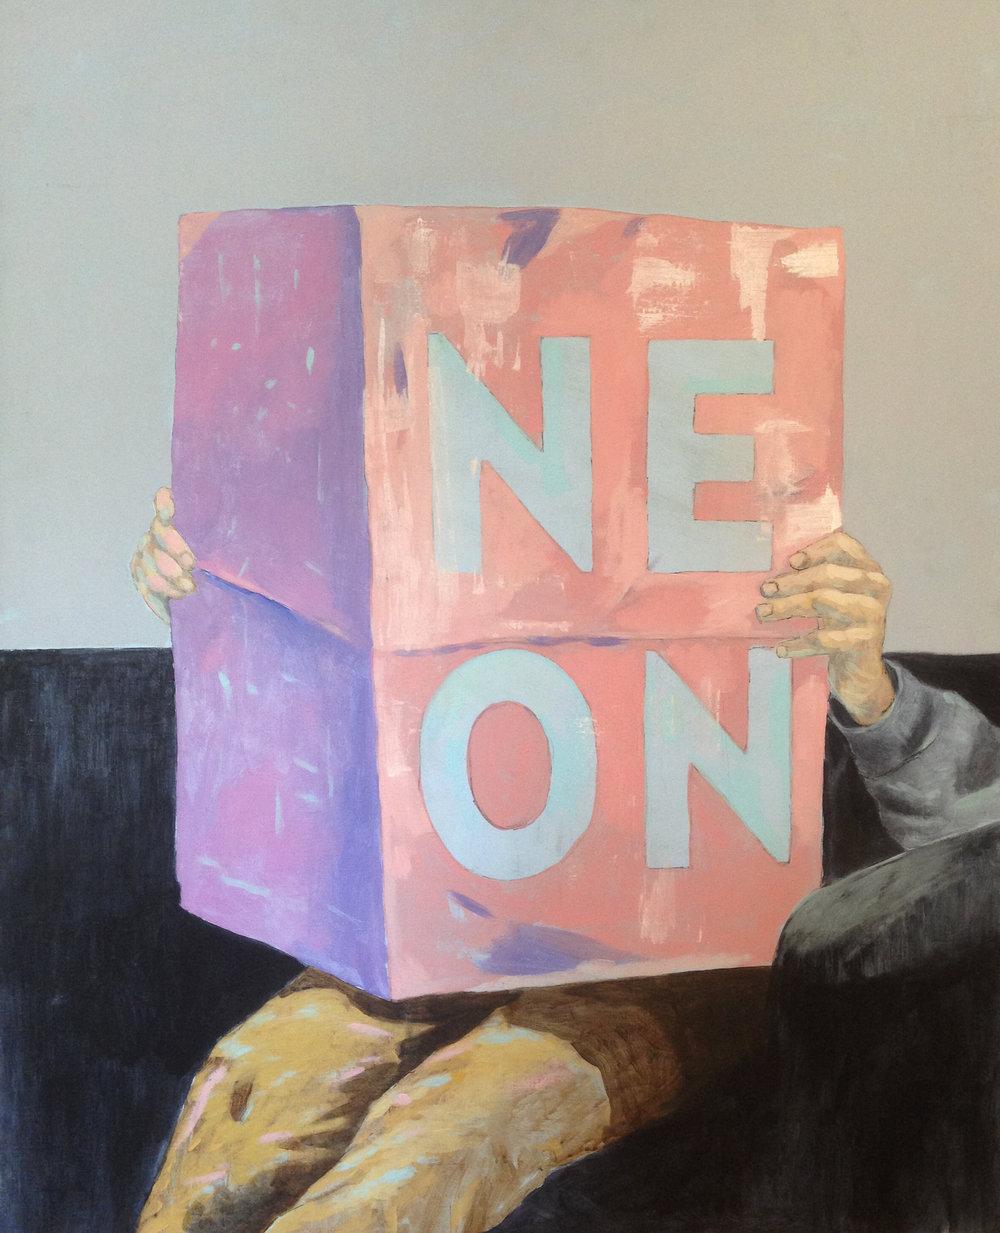 Neon news_холст:акрил_2015_110:90.JPG